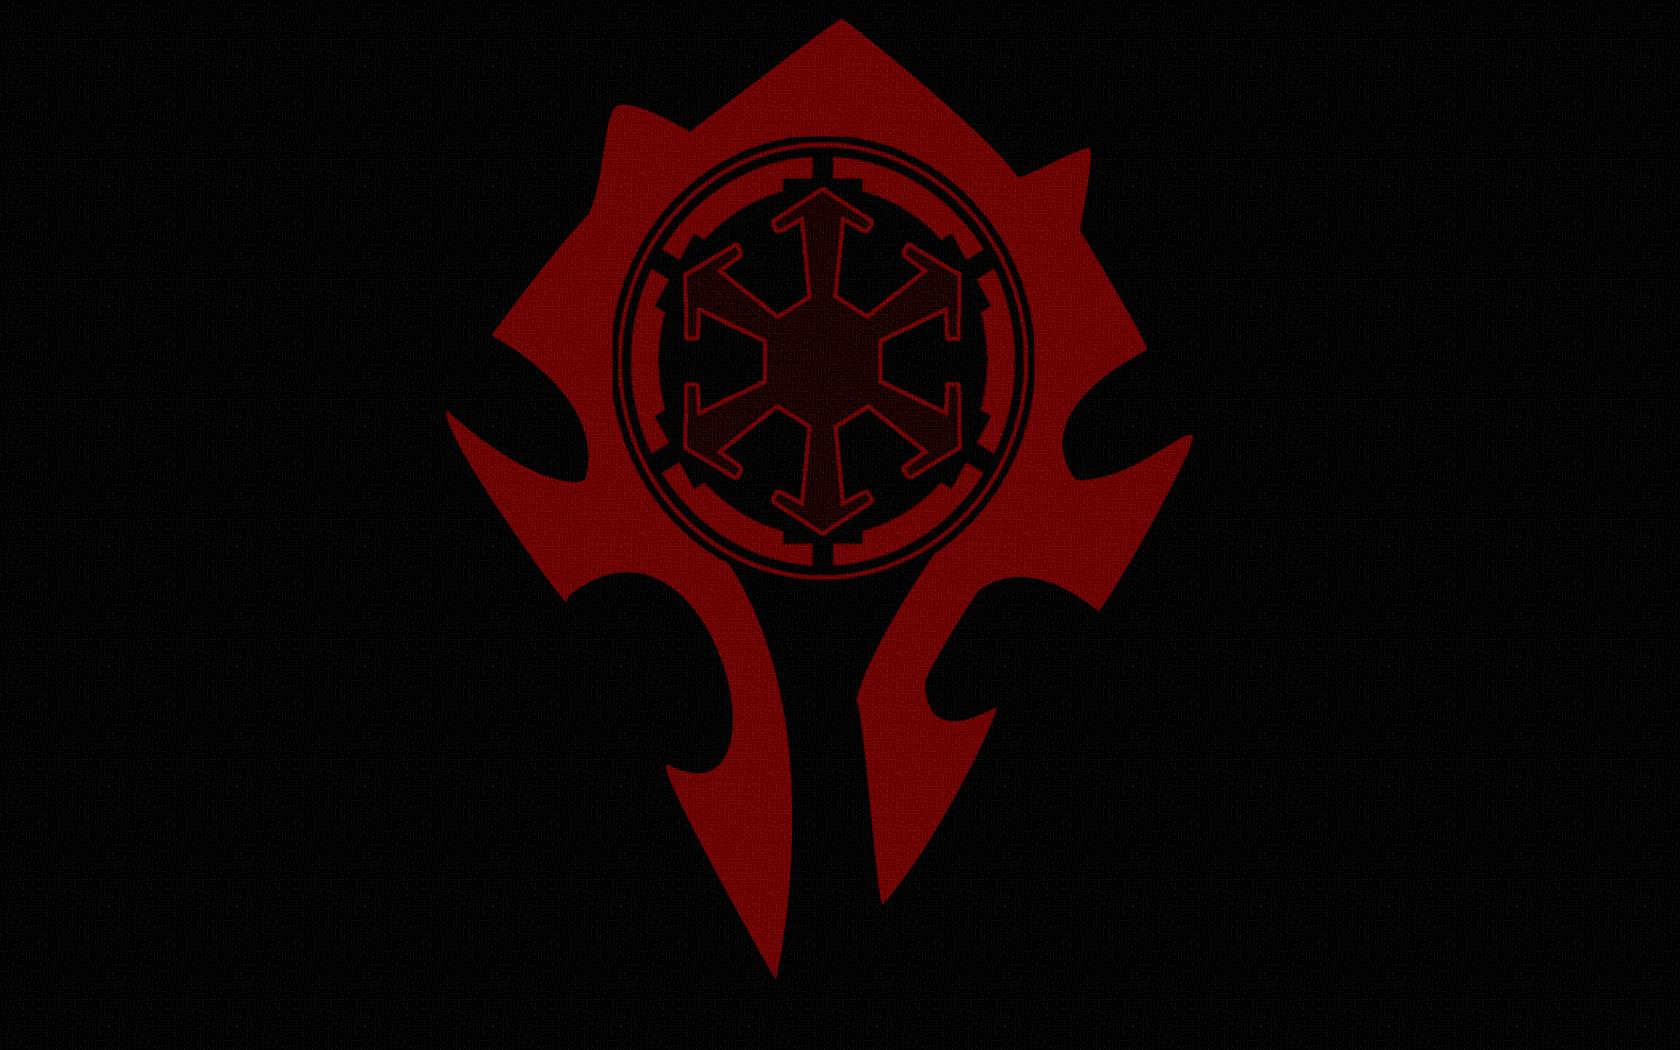 Sith Horde 1 Star Wars World Of Warcraft Wallp By Jaxxtraxx On